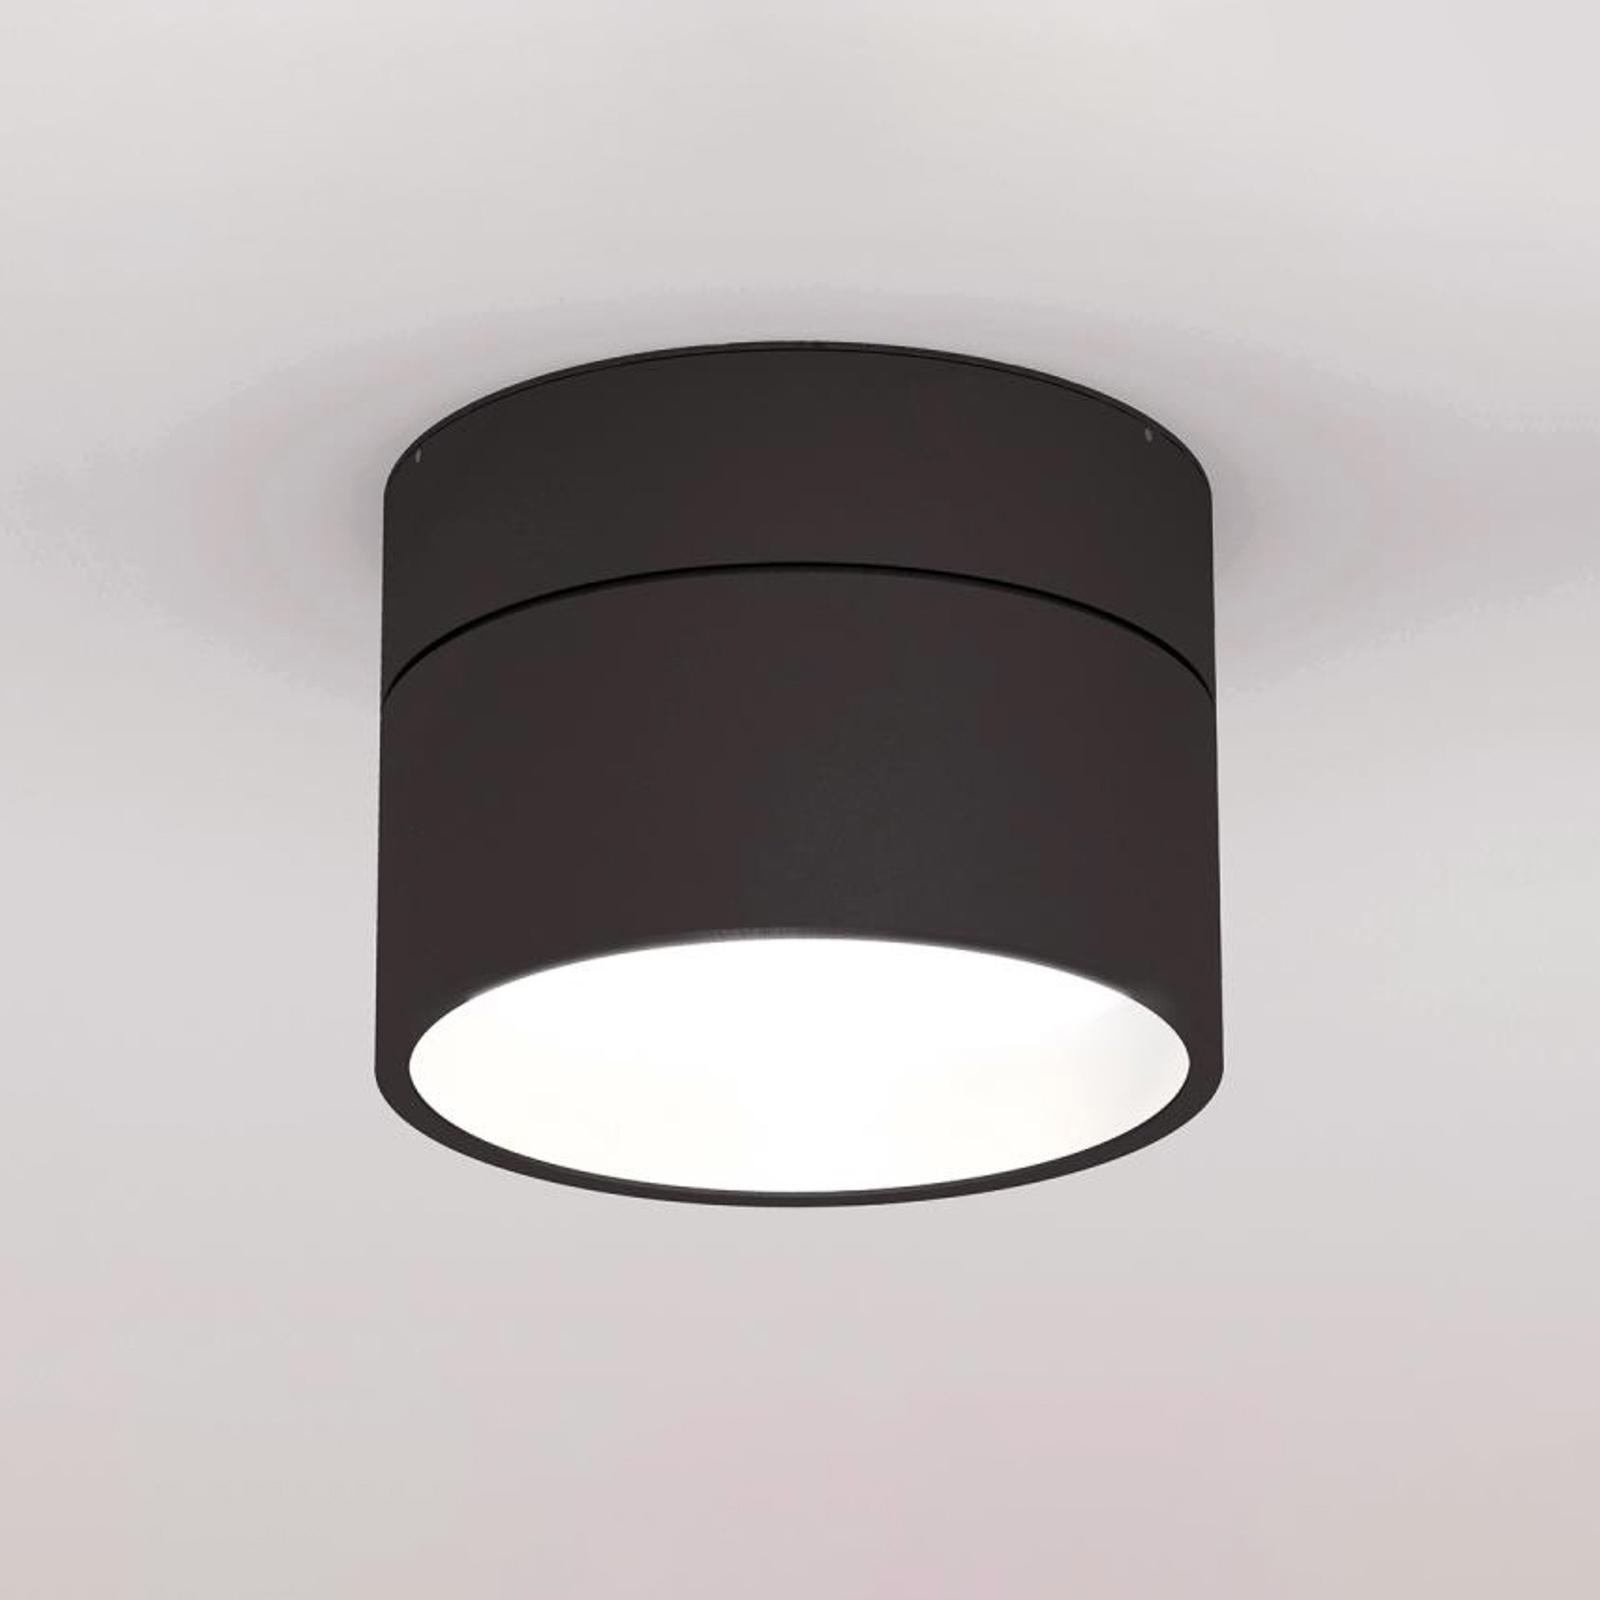 LOUM Turn on LED-taklampe dim 2700K svart/ hvit